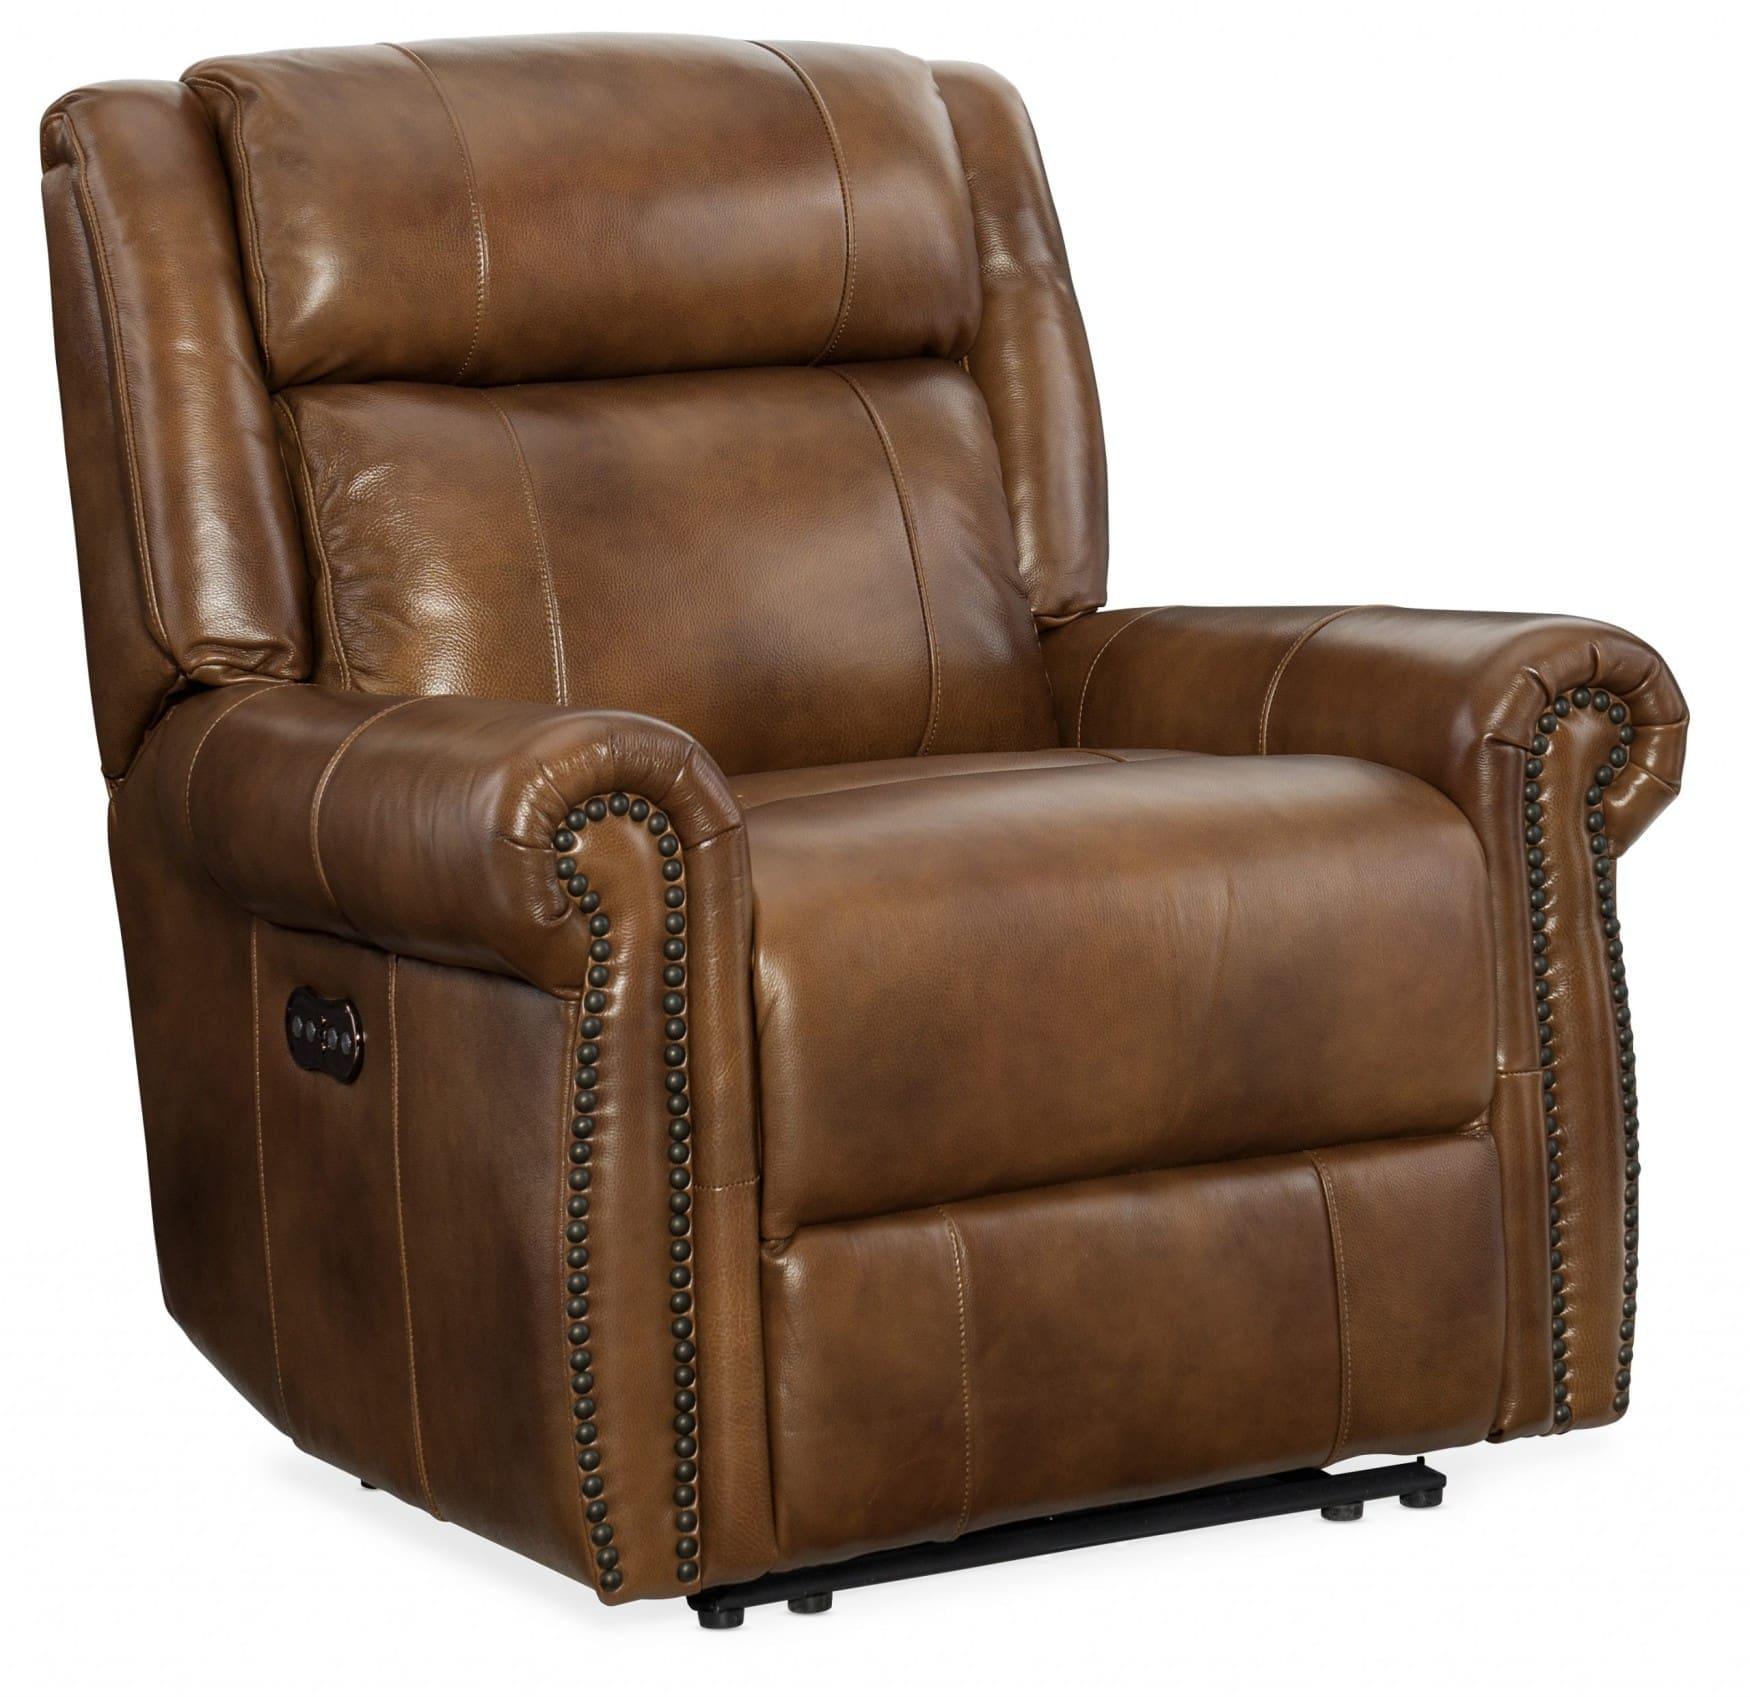 Esme Power Recliner w/ Power Headrest